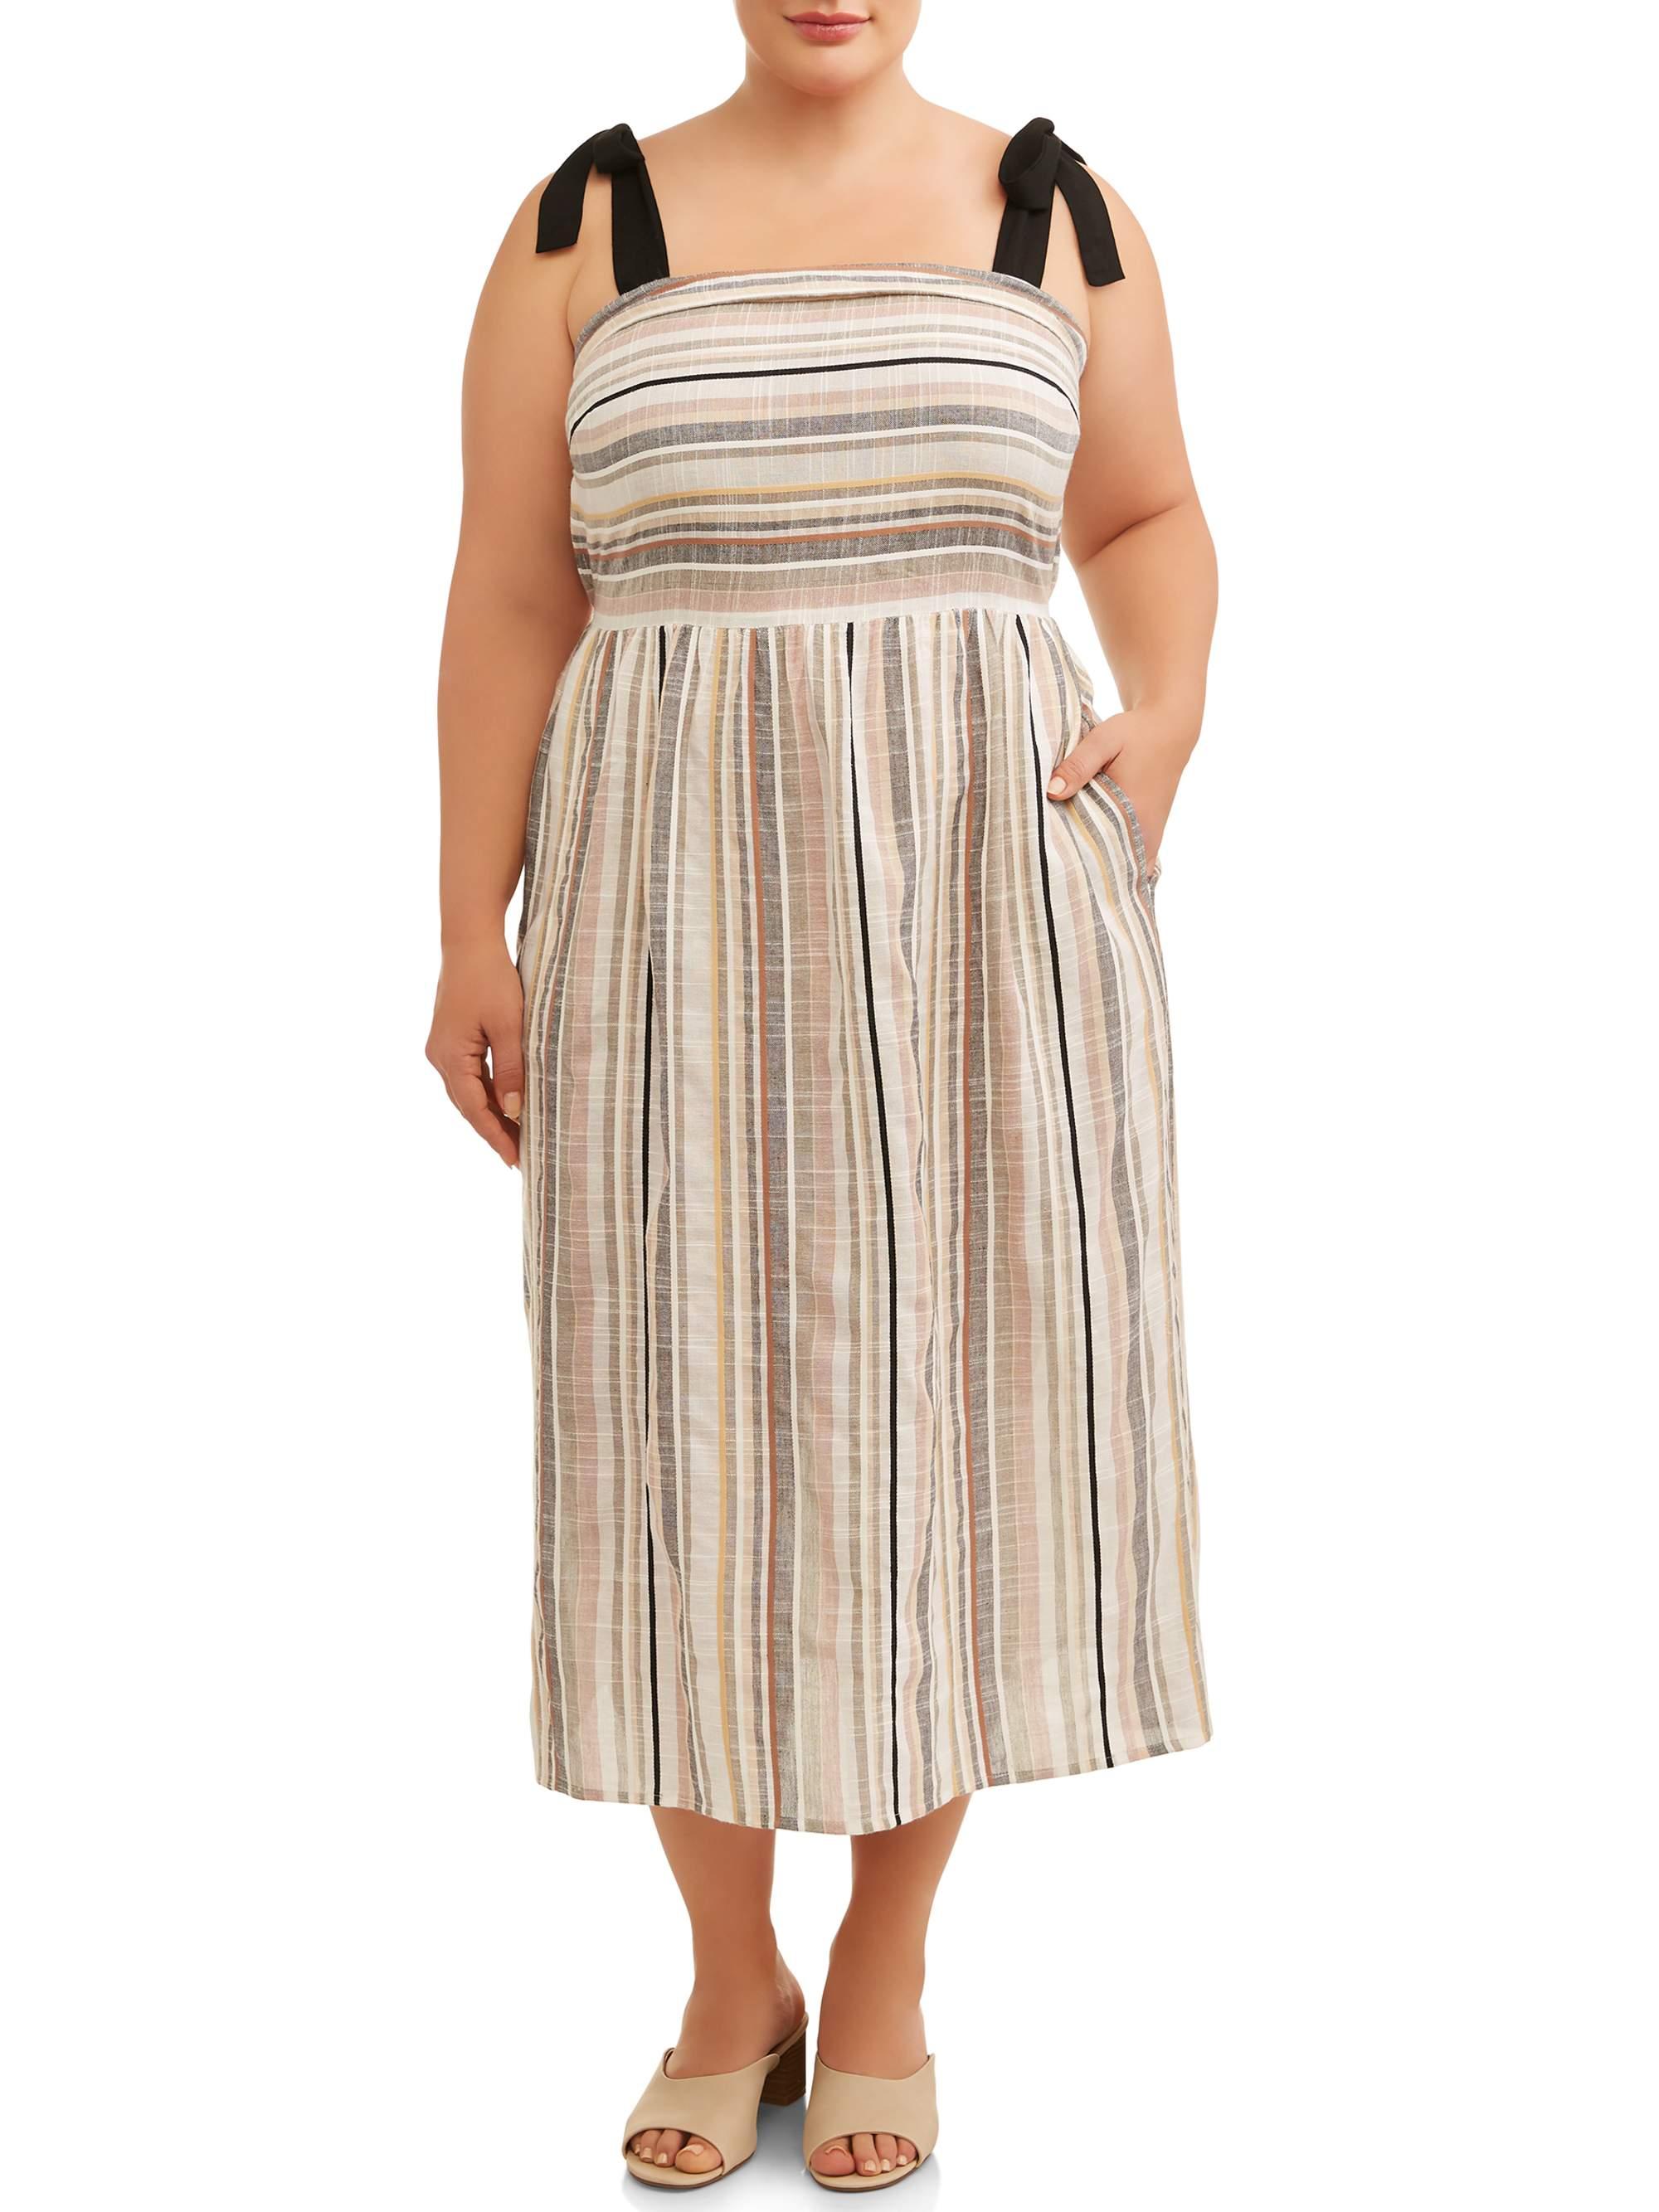 Women's Plus Size Neutral Stripe Midi Dress with Tie Sleeves